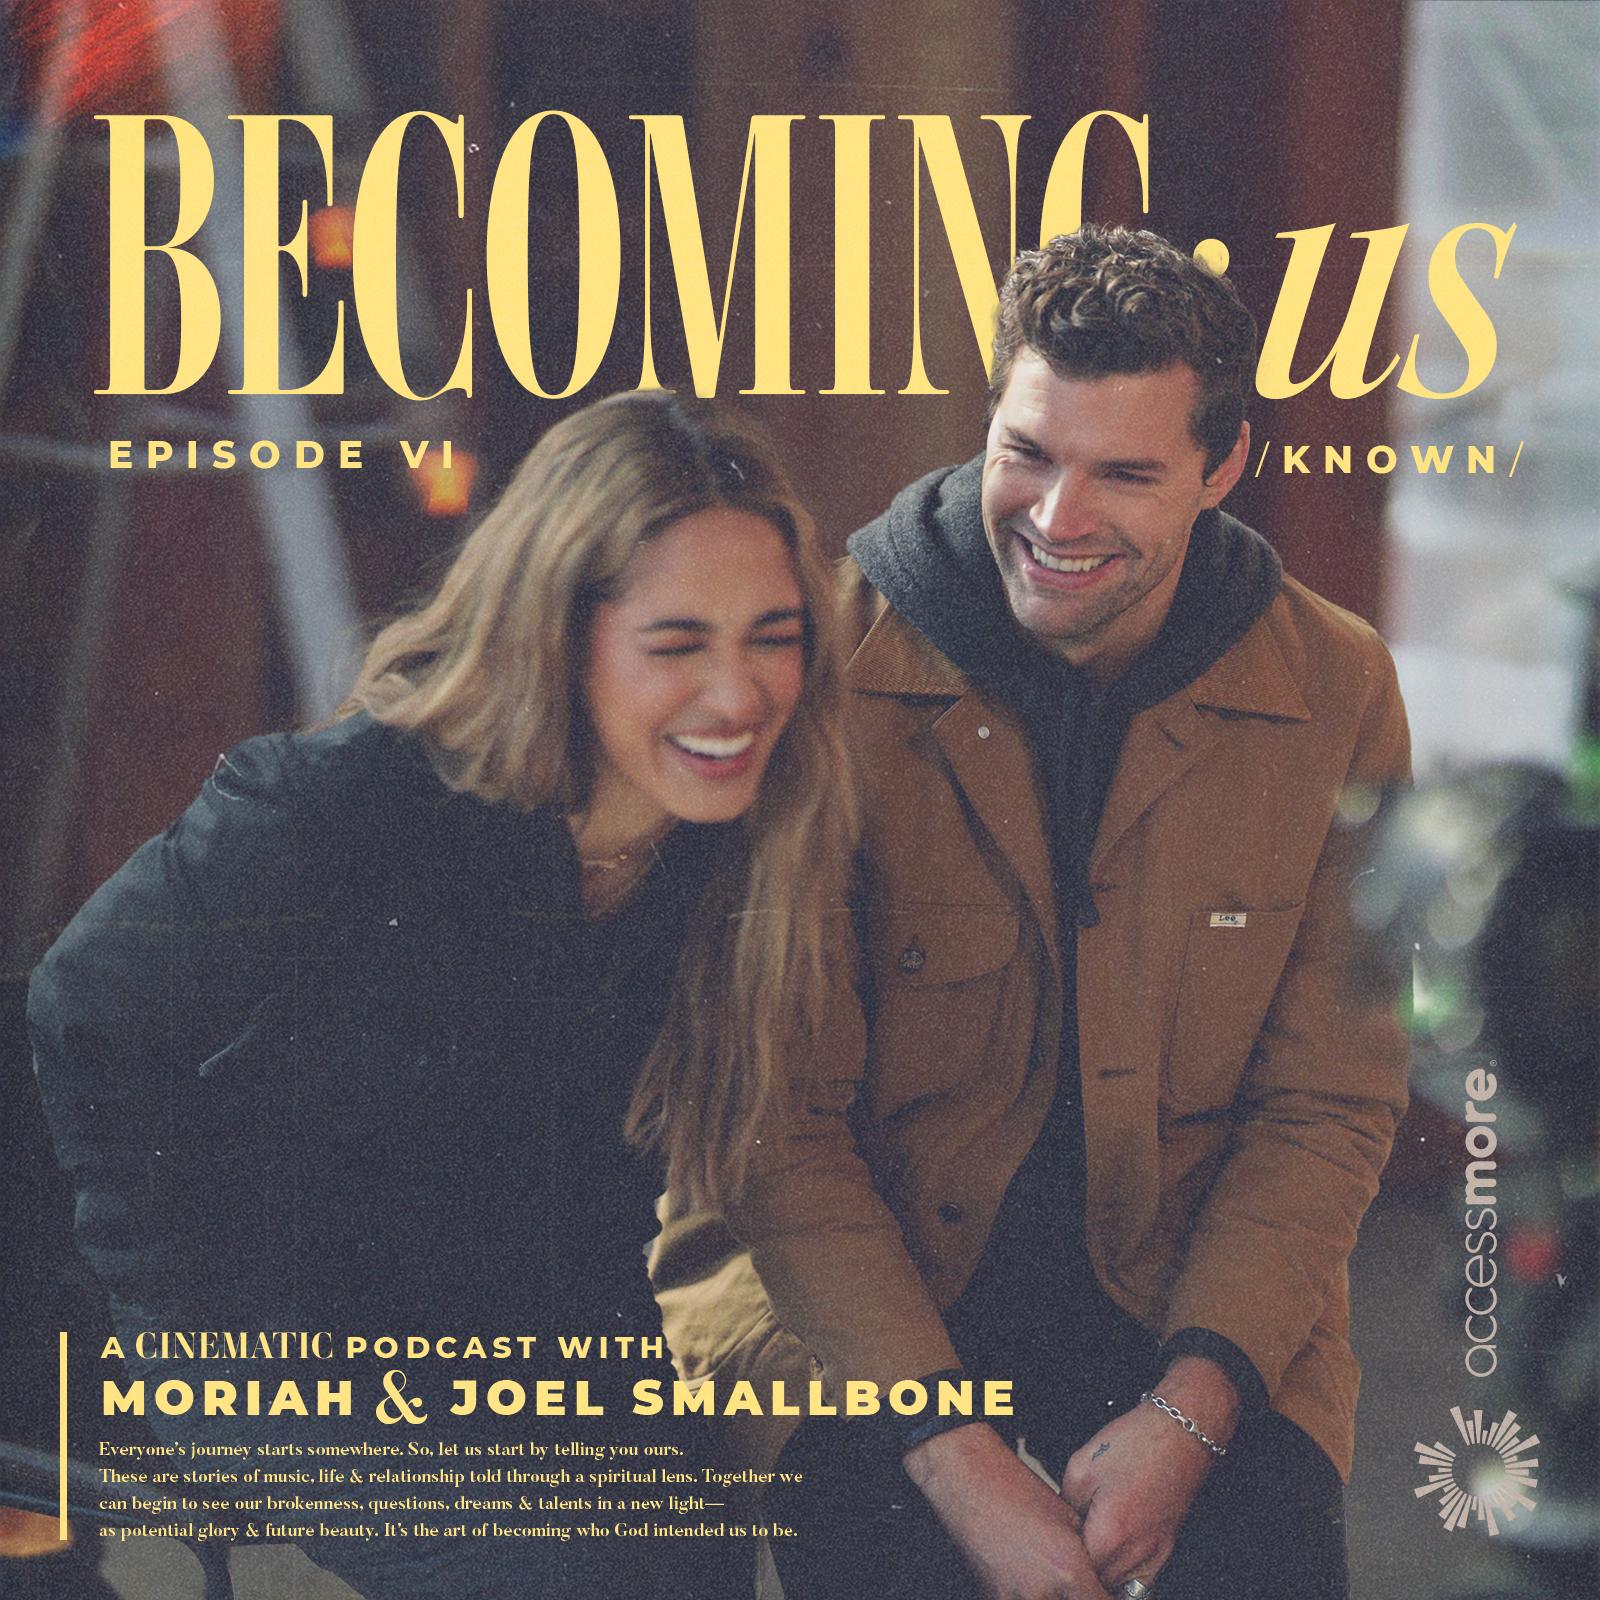 BECOMING:us with Moriah & Joel Smallbone